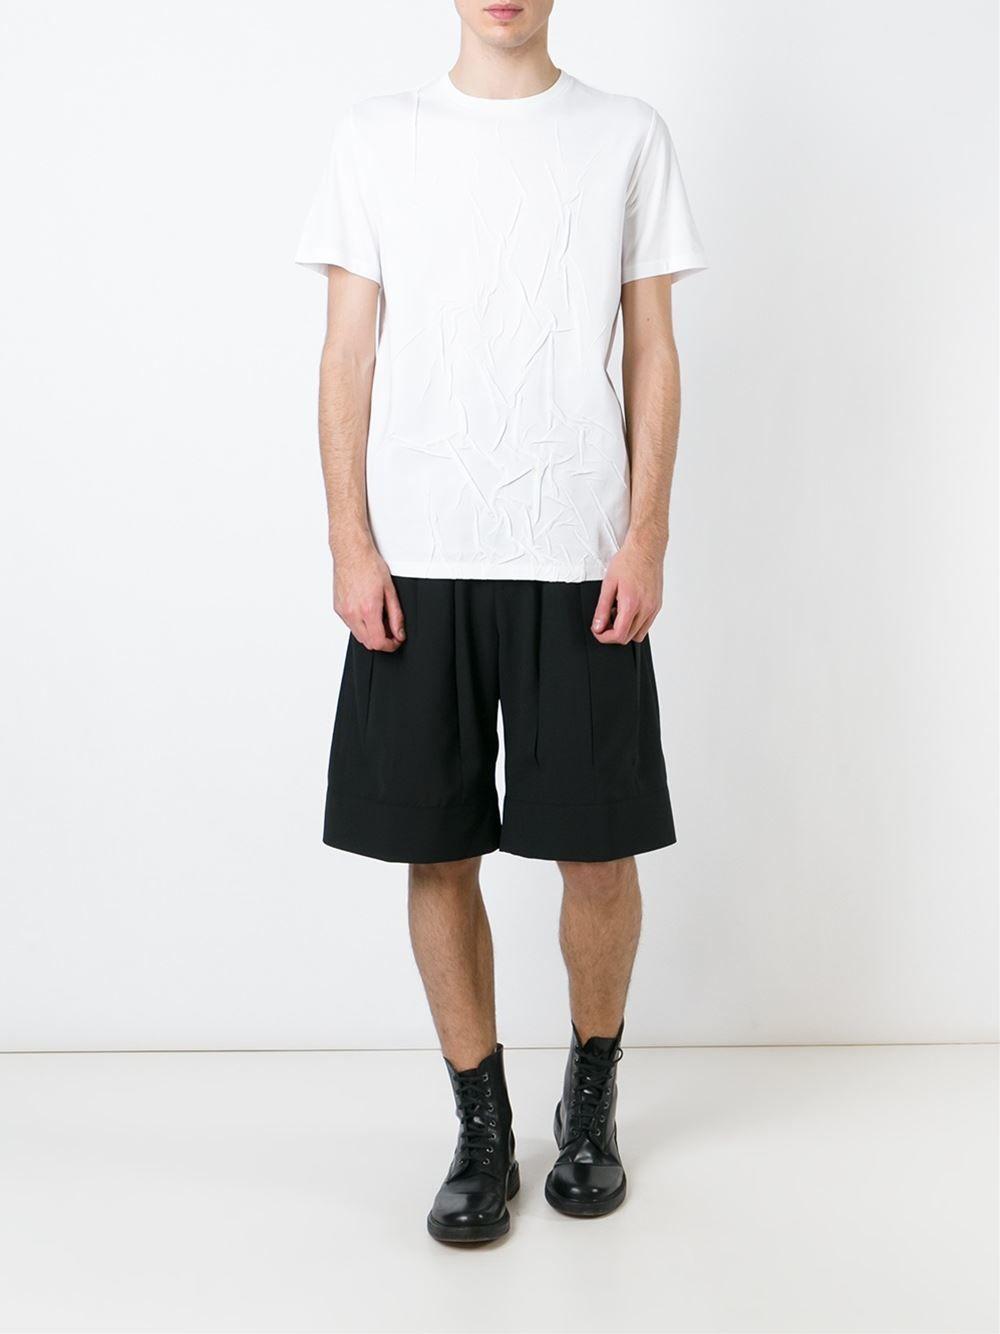 MAISON MARGIELA /// メゾンマルジェラ Wrinkled T-shirts しわ加工Tシャツ (WHT) 白